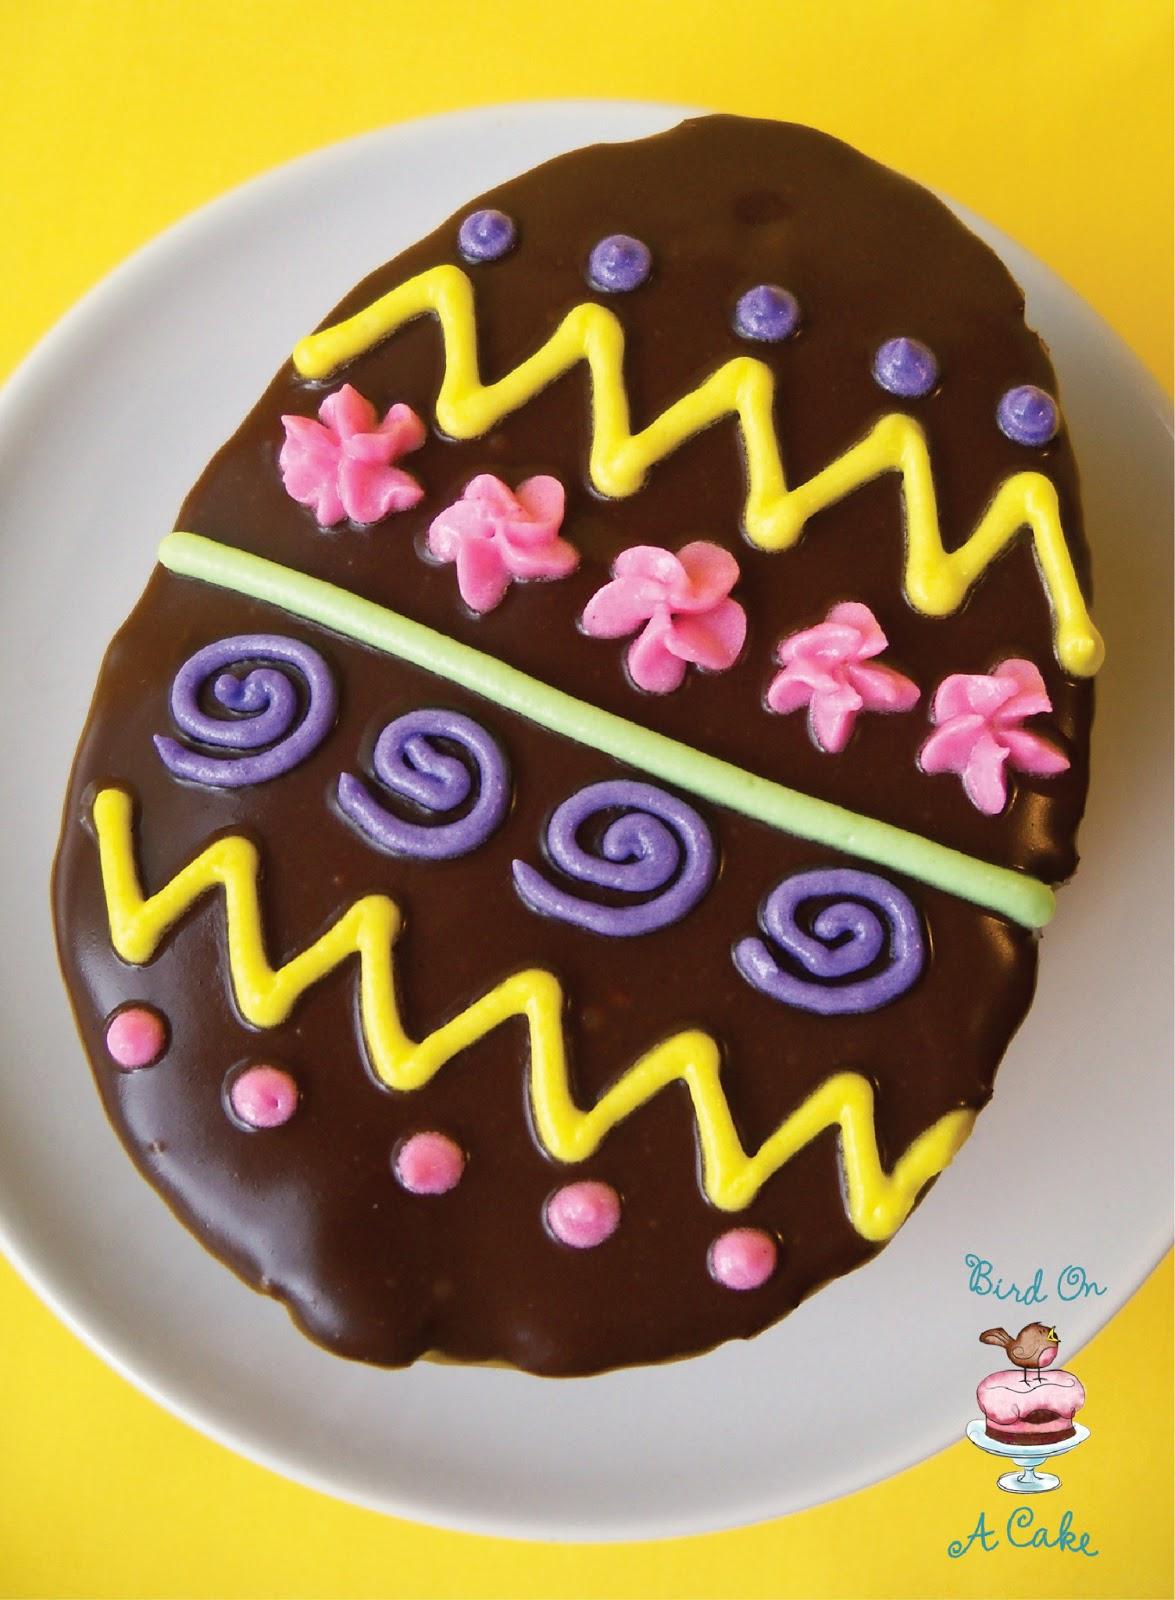 Bird On A Cake: Chocolate Easter Egg Mini Cakes